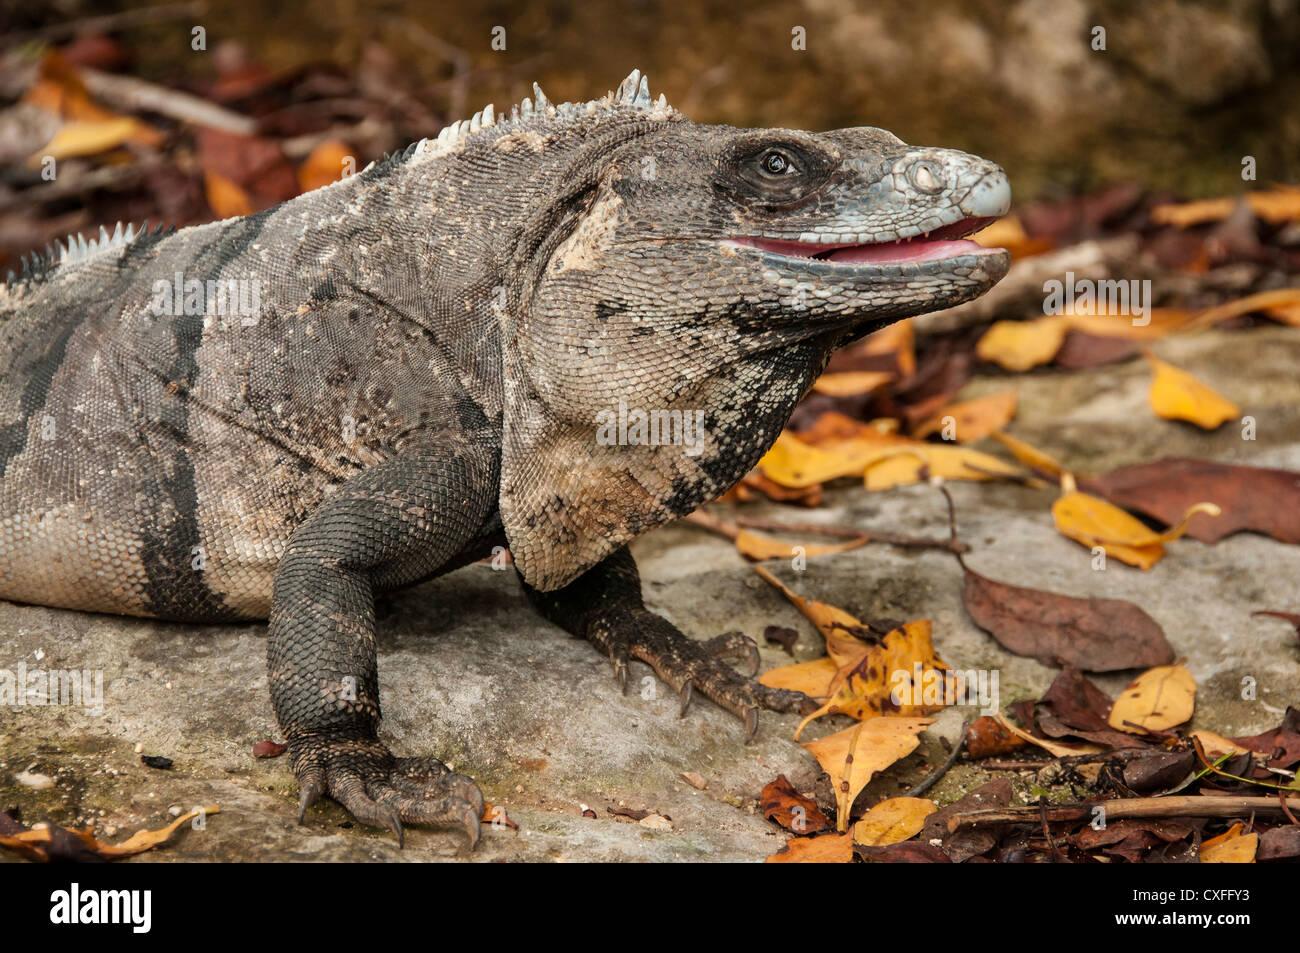 Iguana at Xel-Ha nature park, Riviera Maya, Mexico. - Stock Image